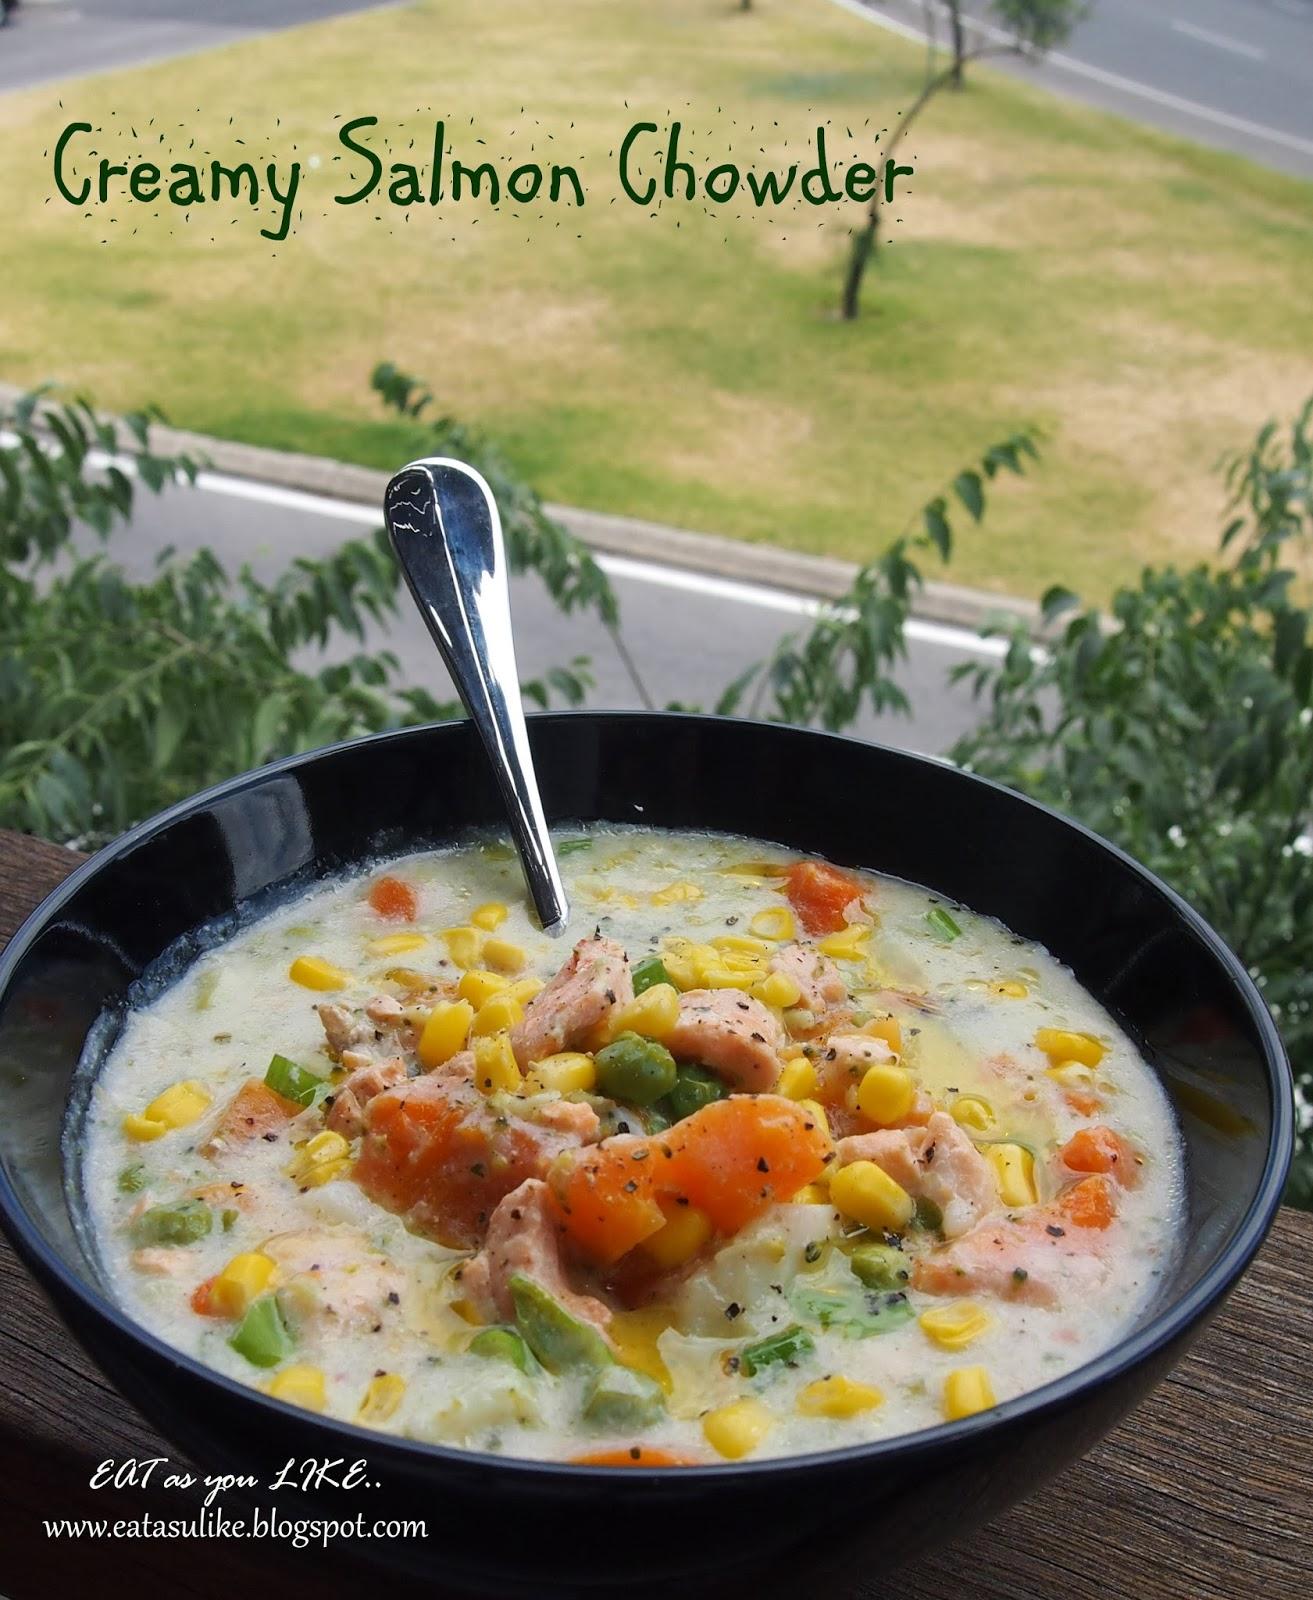 http://eatasulike.blogspot.com.au/2014/03/creamy-salmon-chowder.html